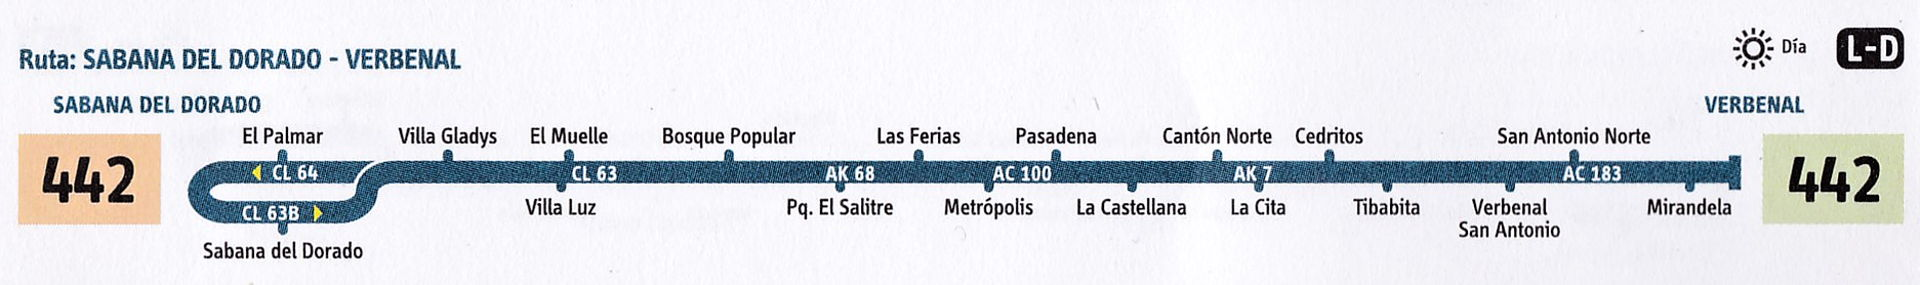 Ruta SITP: 442 Sabana del Dorado ↔ Verbenal [Urbana] 3